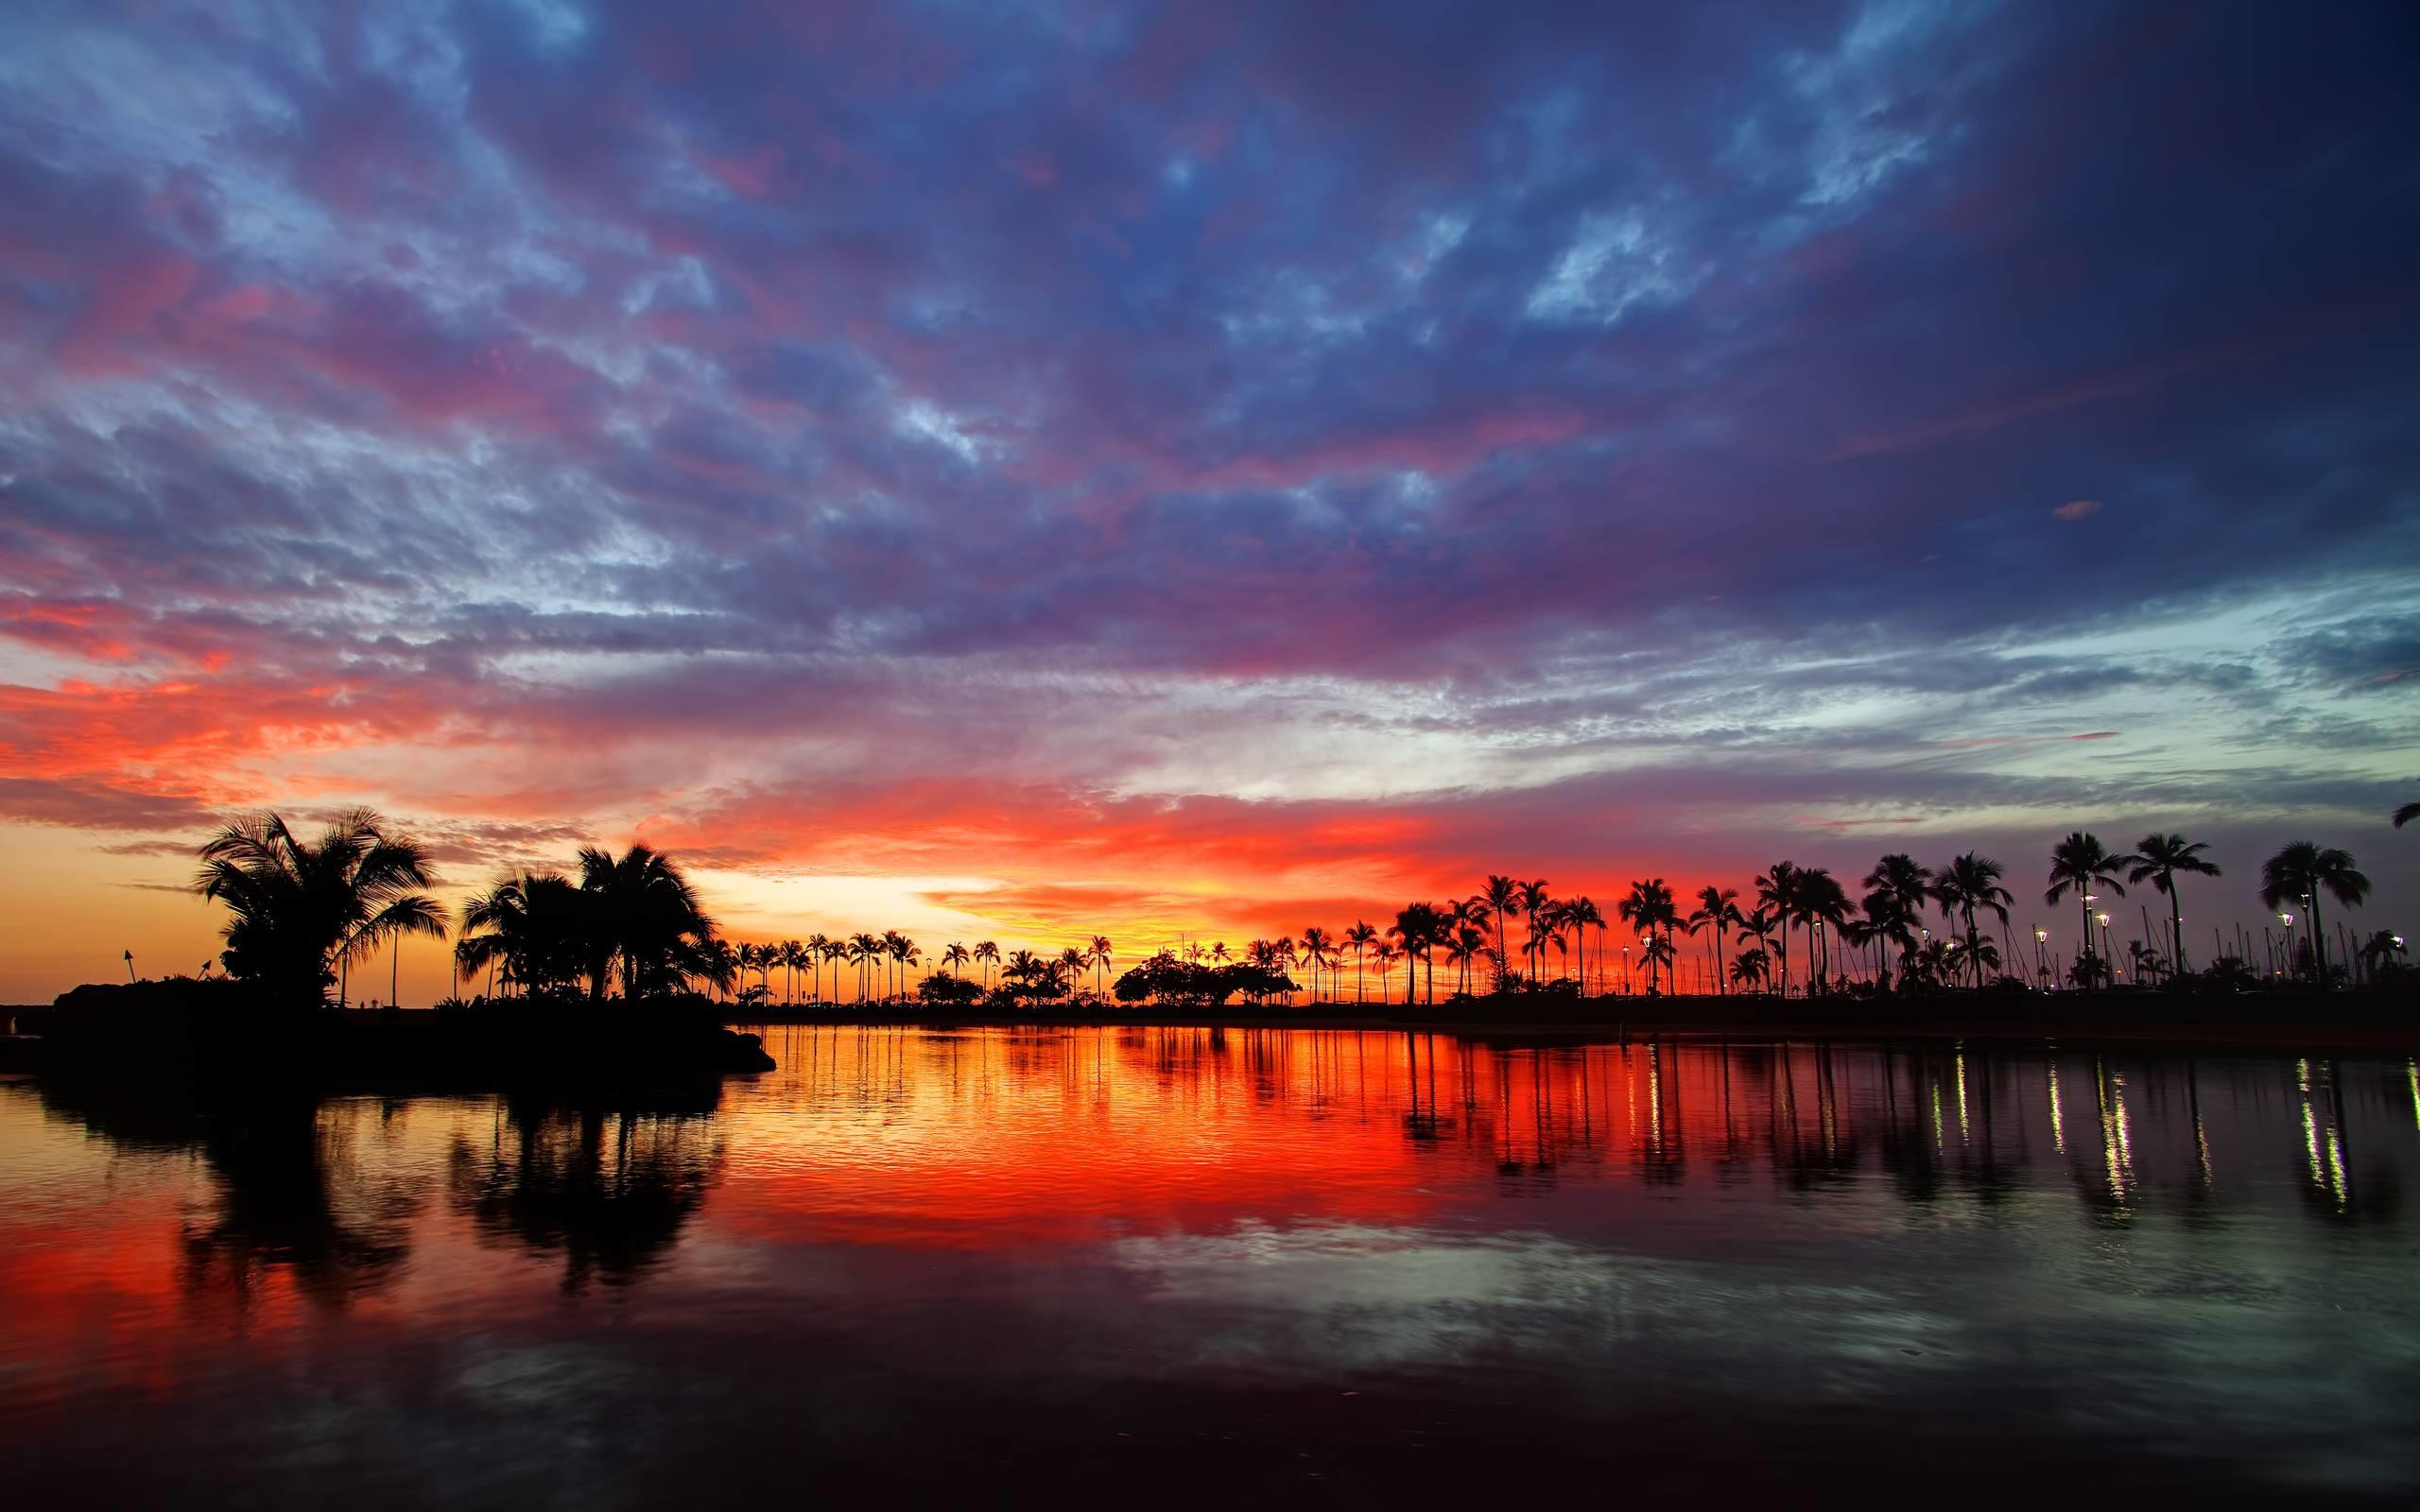 Hawaii Sunset Wallpapers Images 6 HD Wallpapers | Eakai.